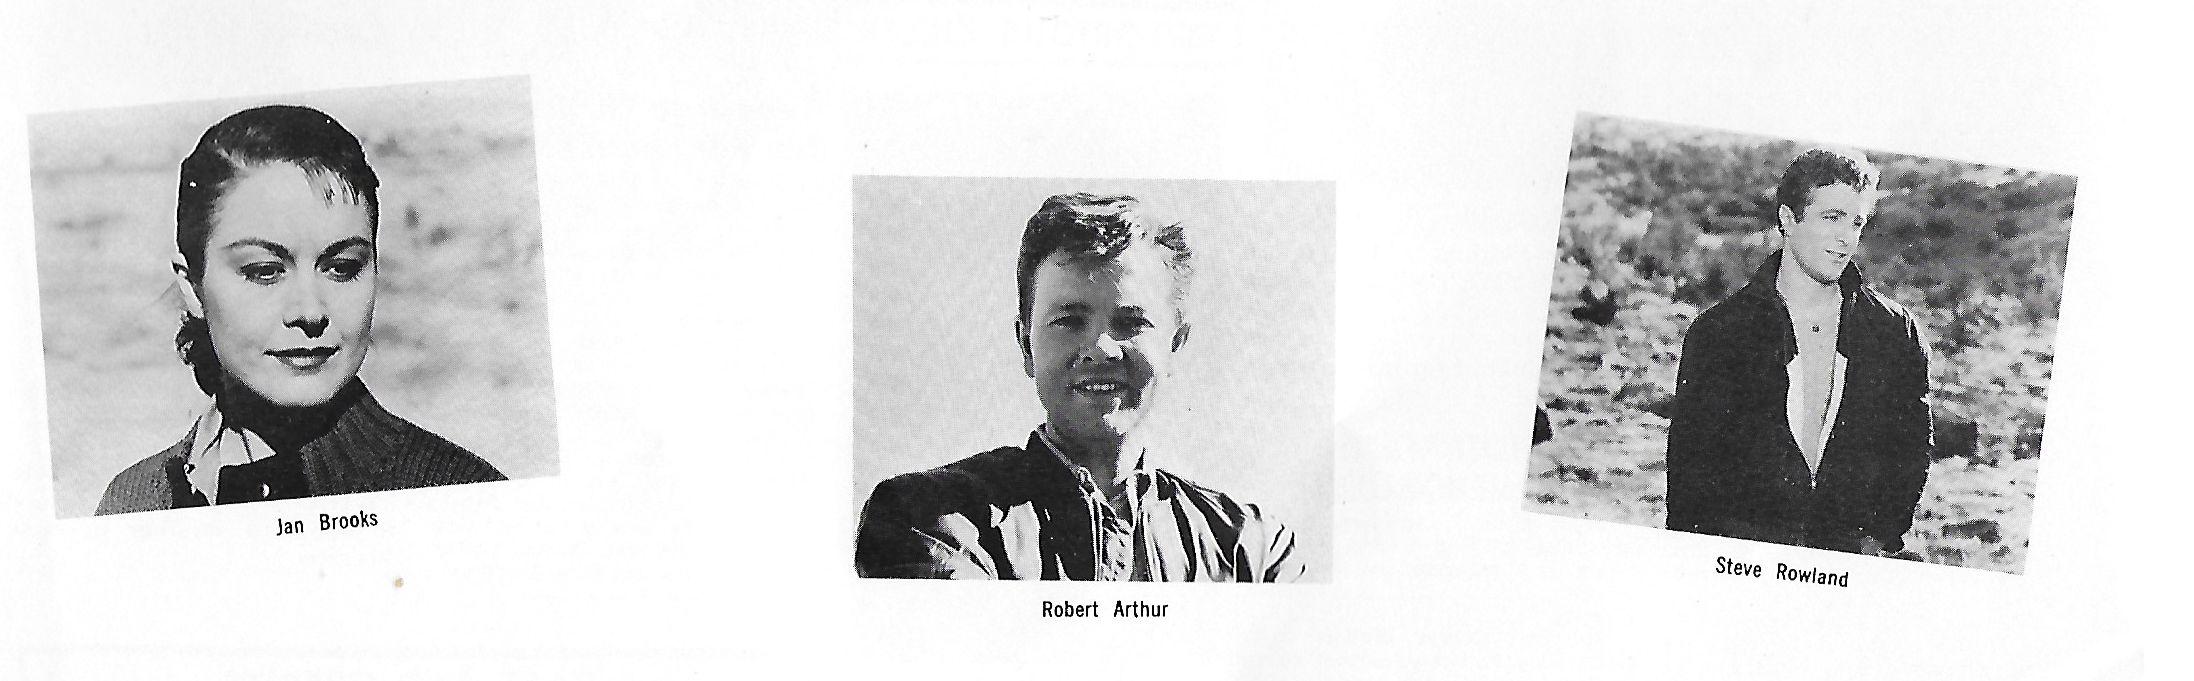 Robert Arthur, Jan Brooks, and Steve Rowland in Wild Youth (1960)